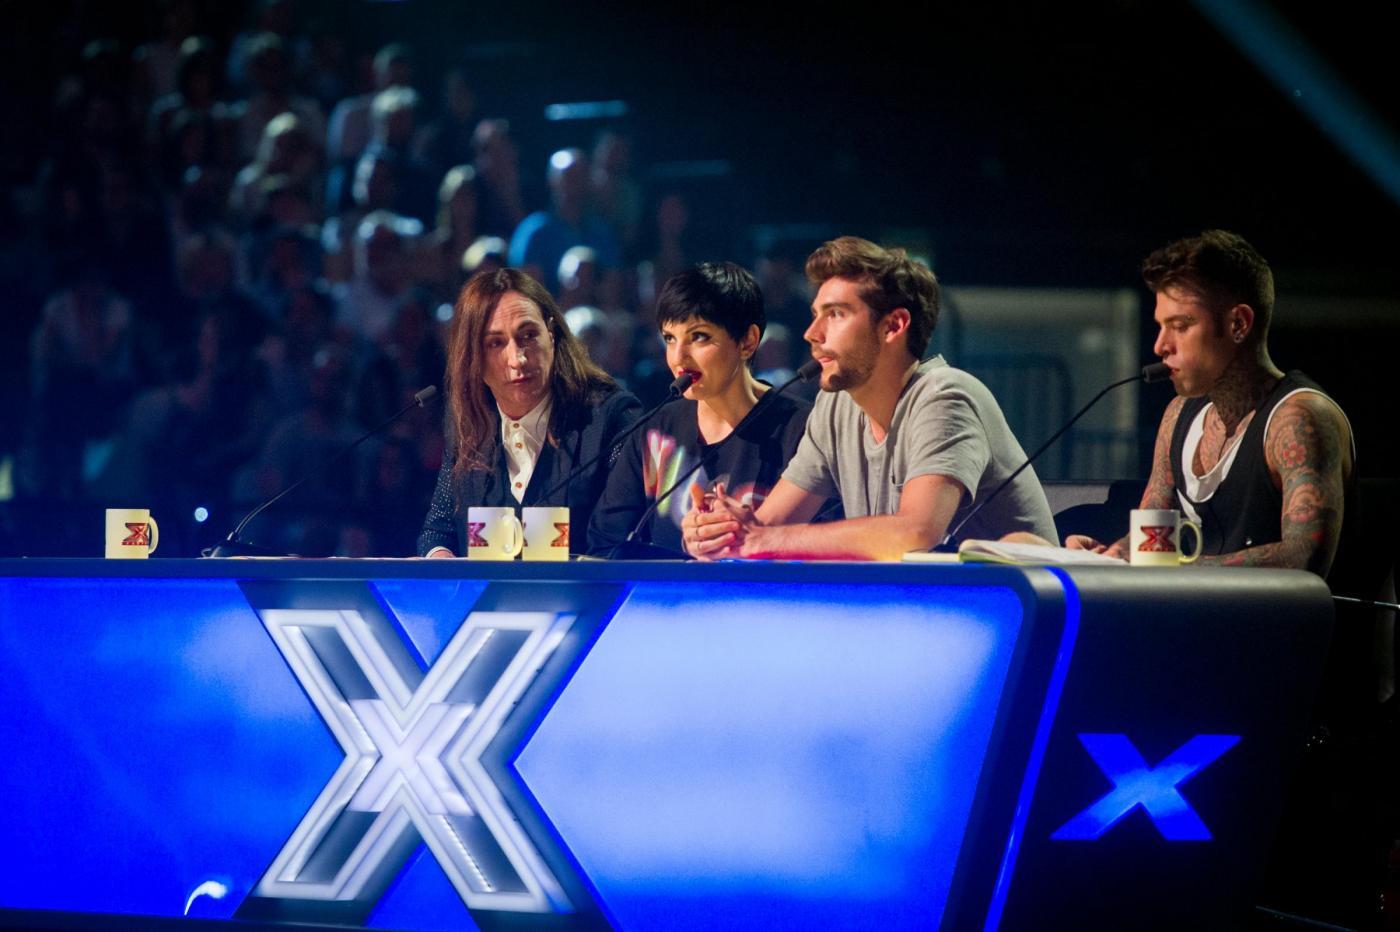 Audizioni trasmissione televisiva X Factor Unipol Arena